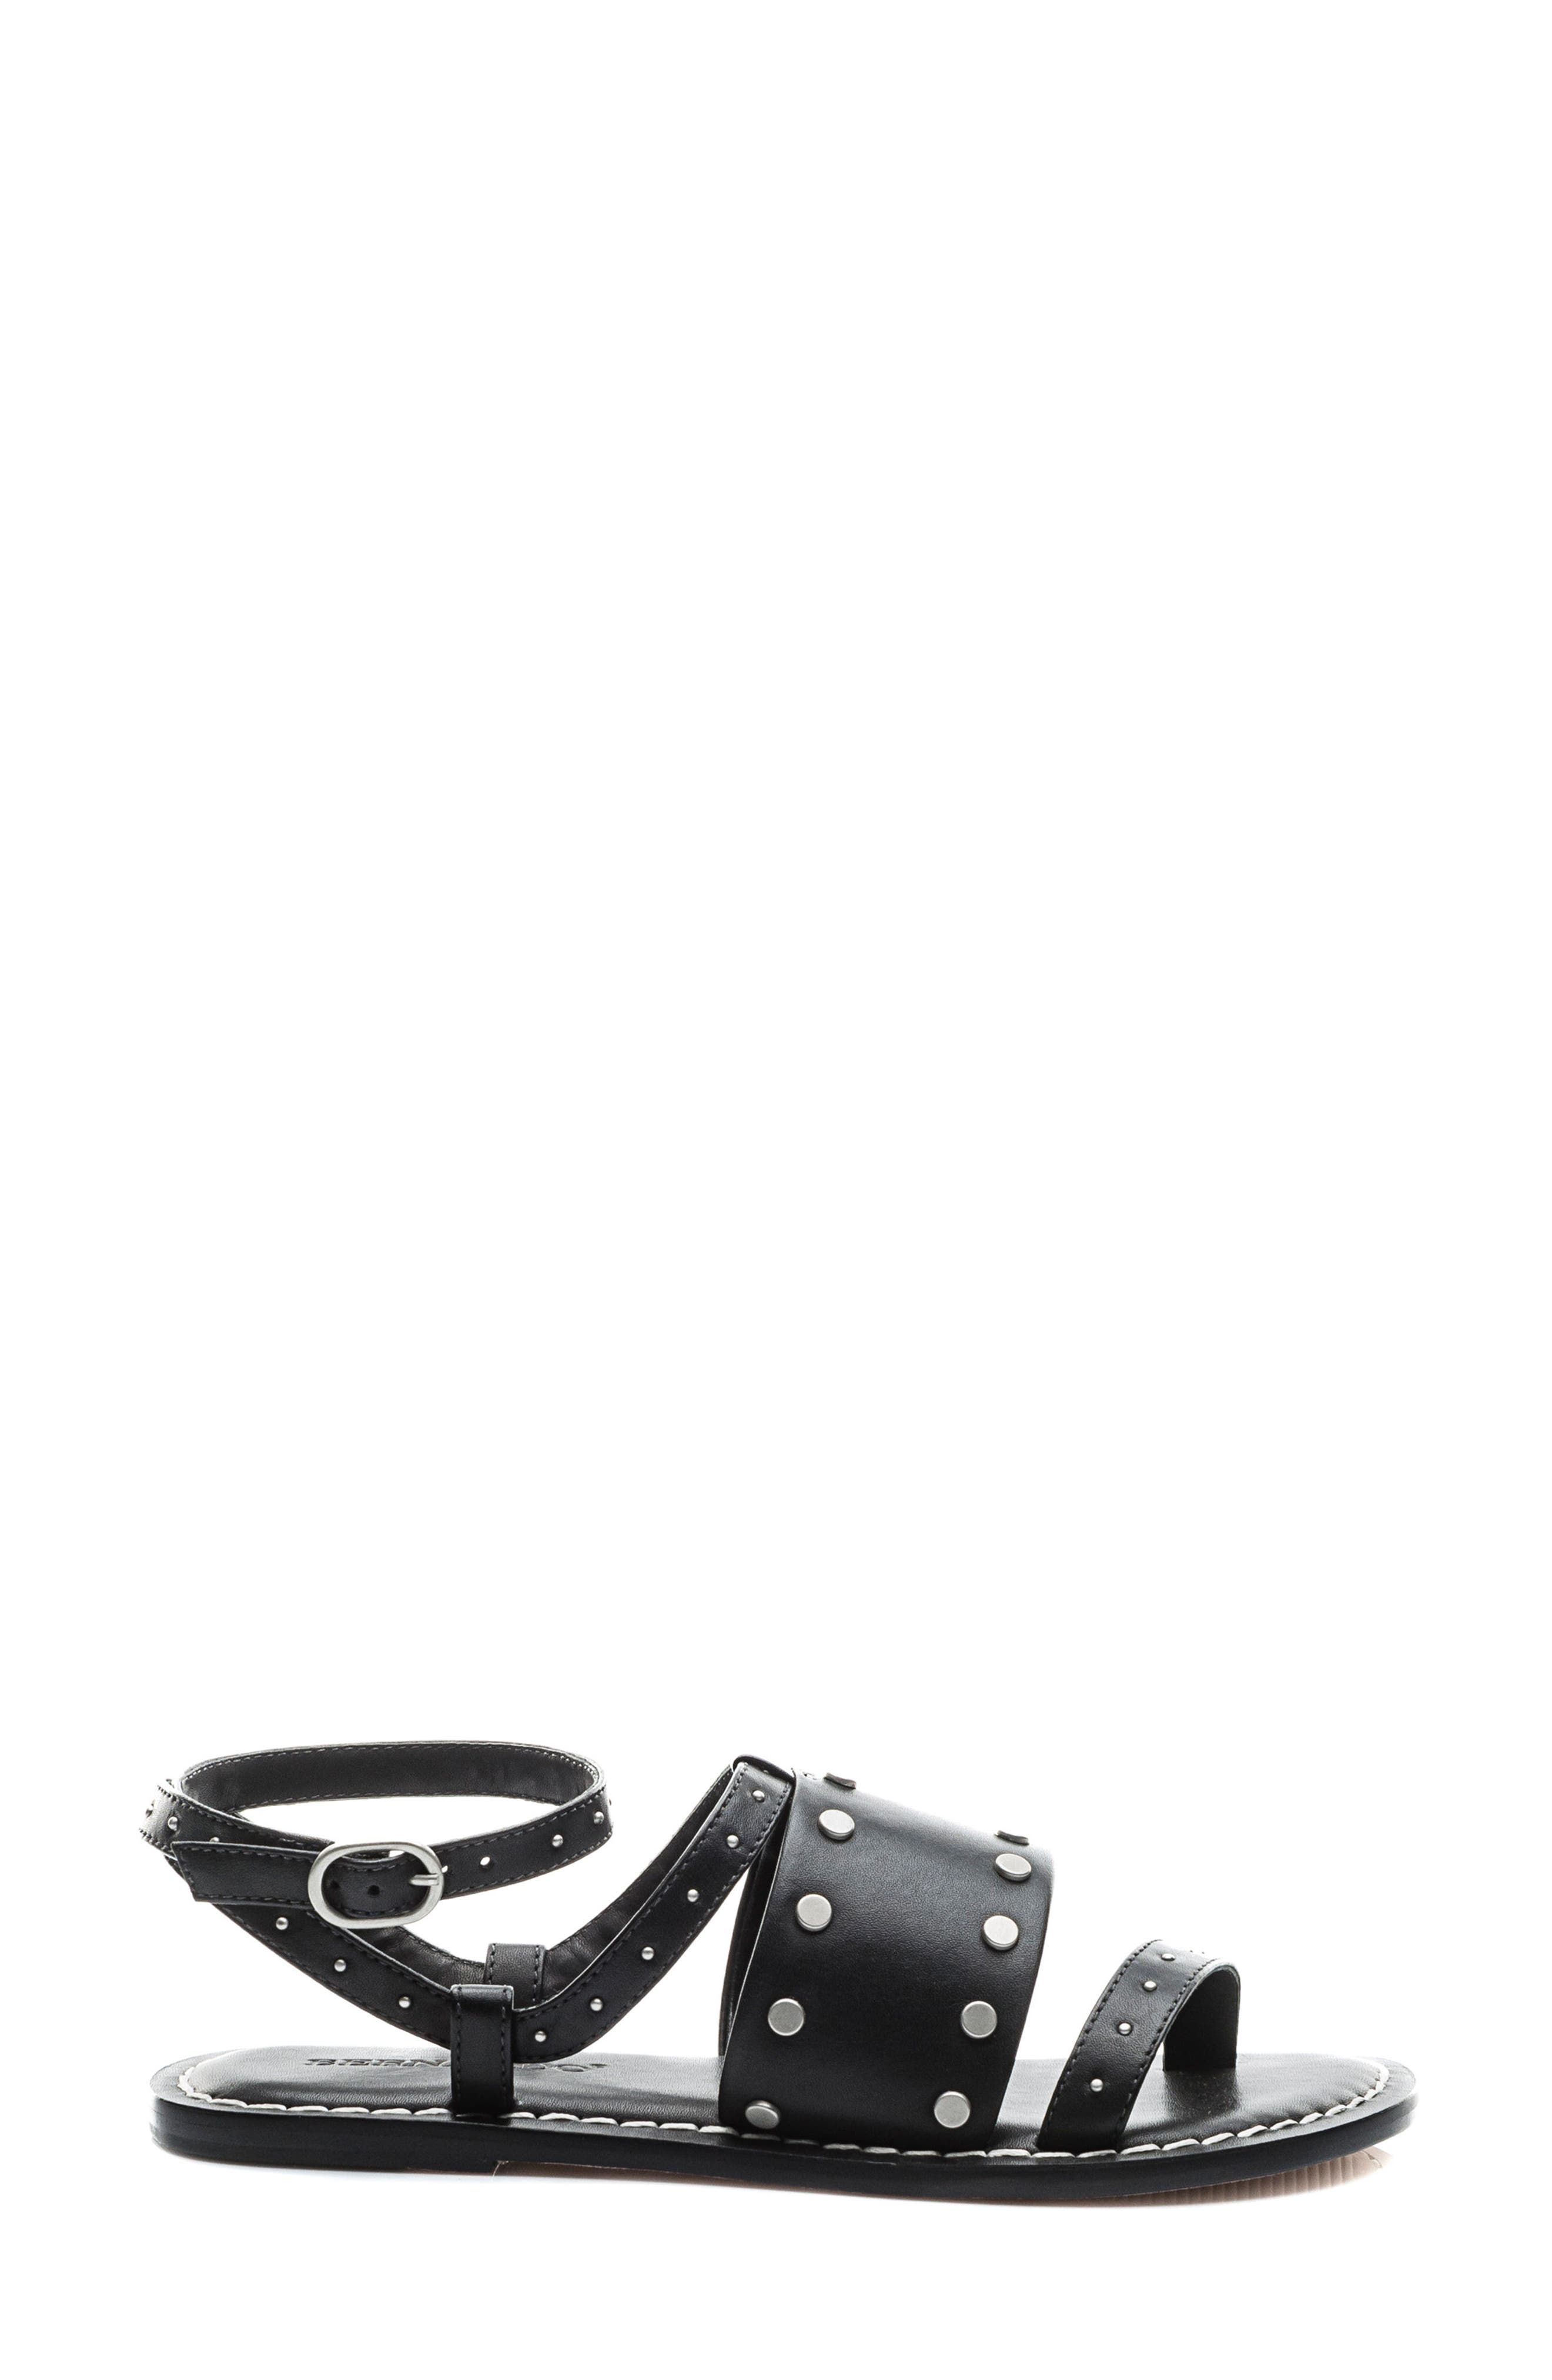 Bernardo Maisa Sandal,                             Alternate thumbnail 3, color,                             Black Leather